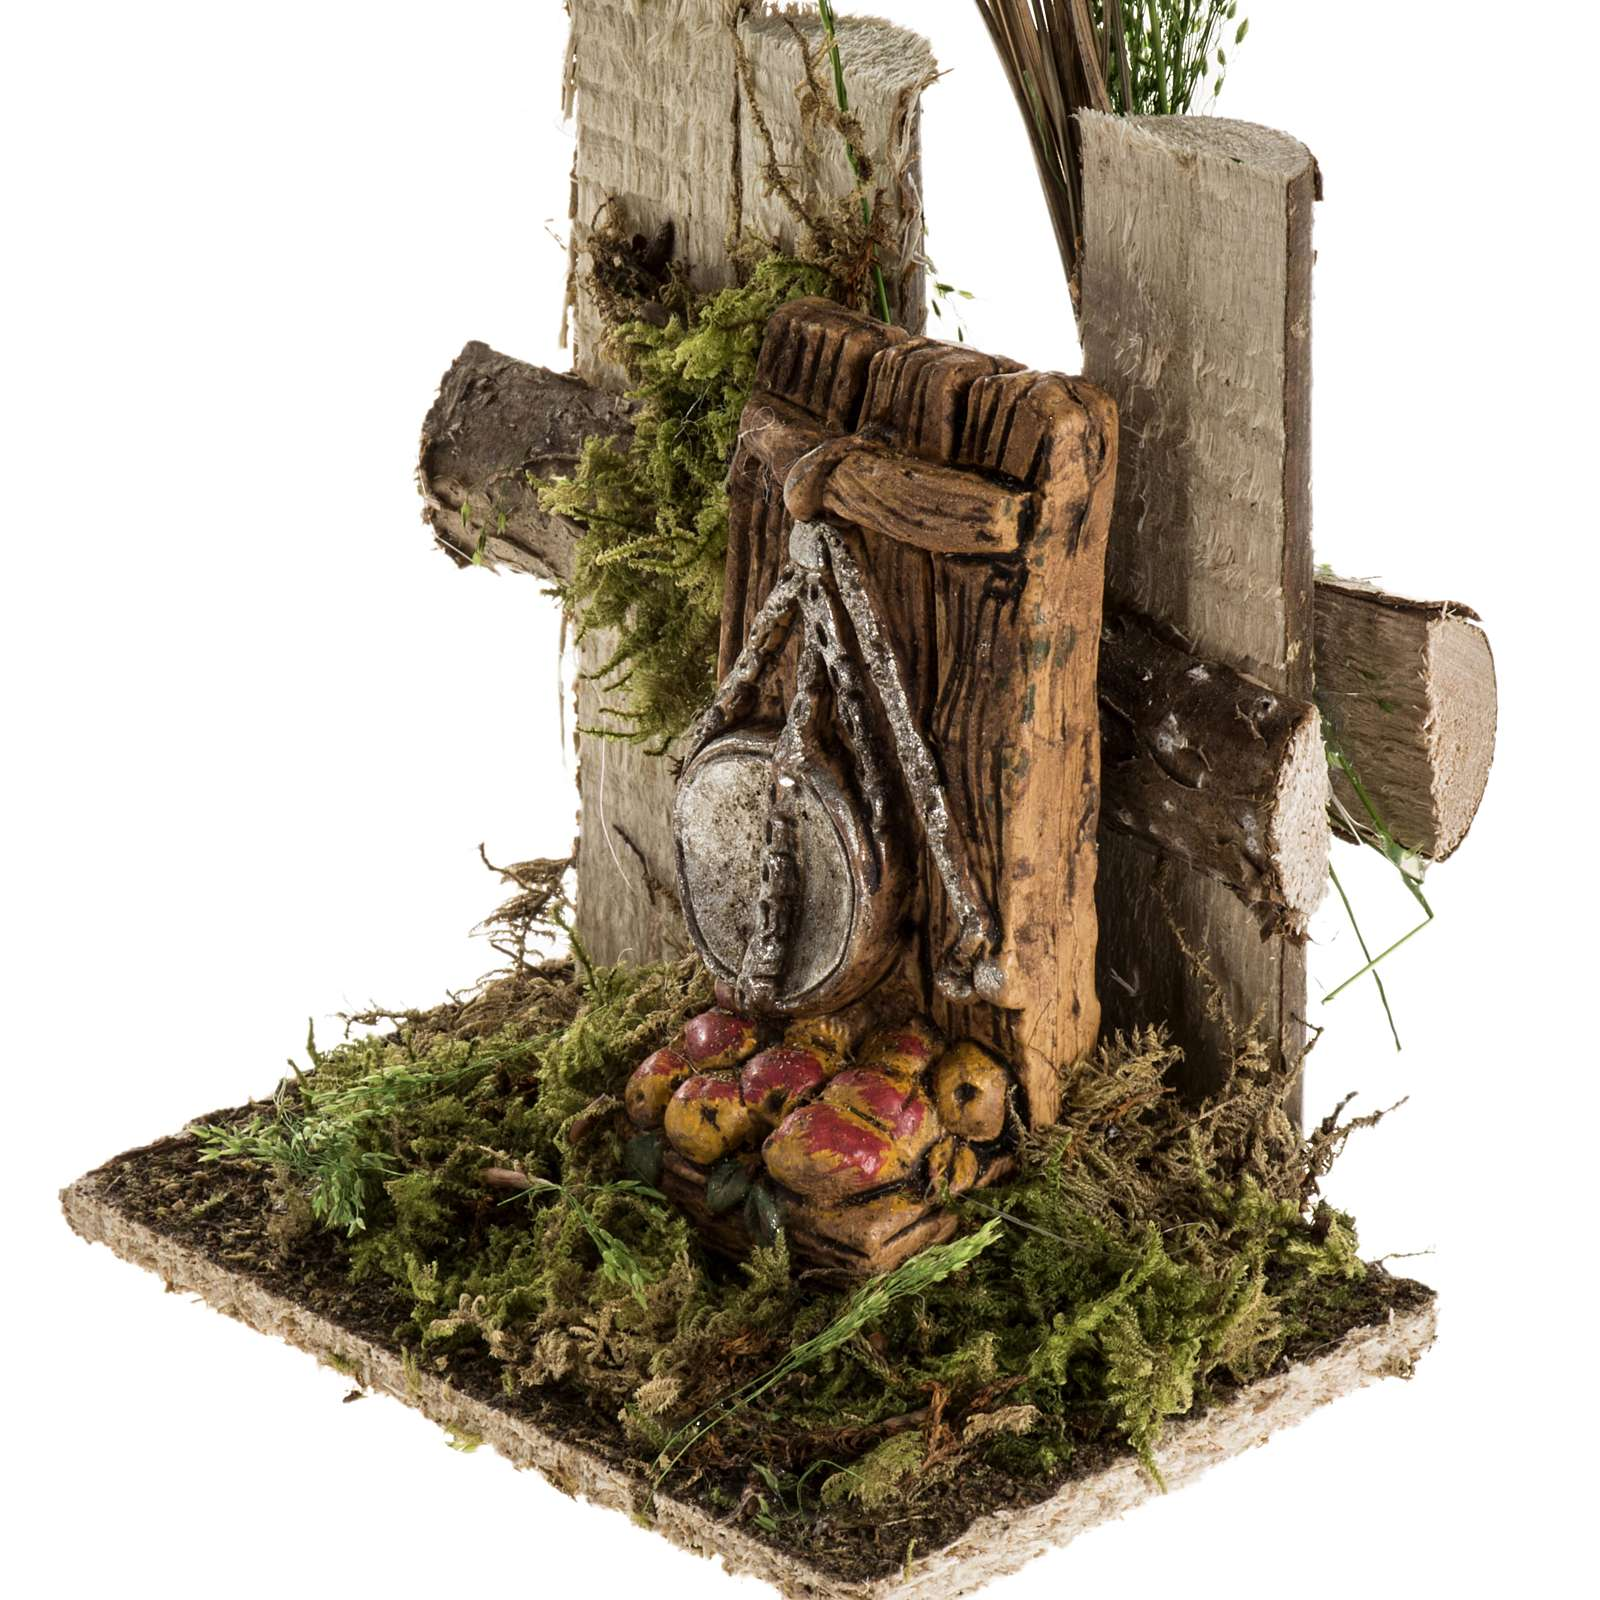 Ambientazione presepe tronchi bilancia frutta 4